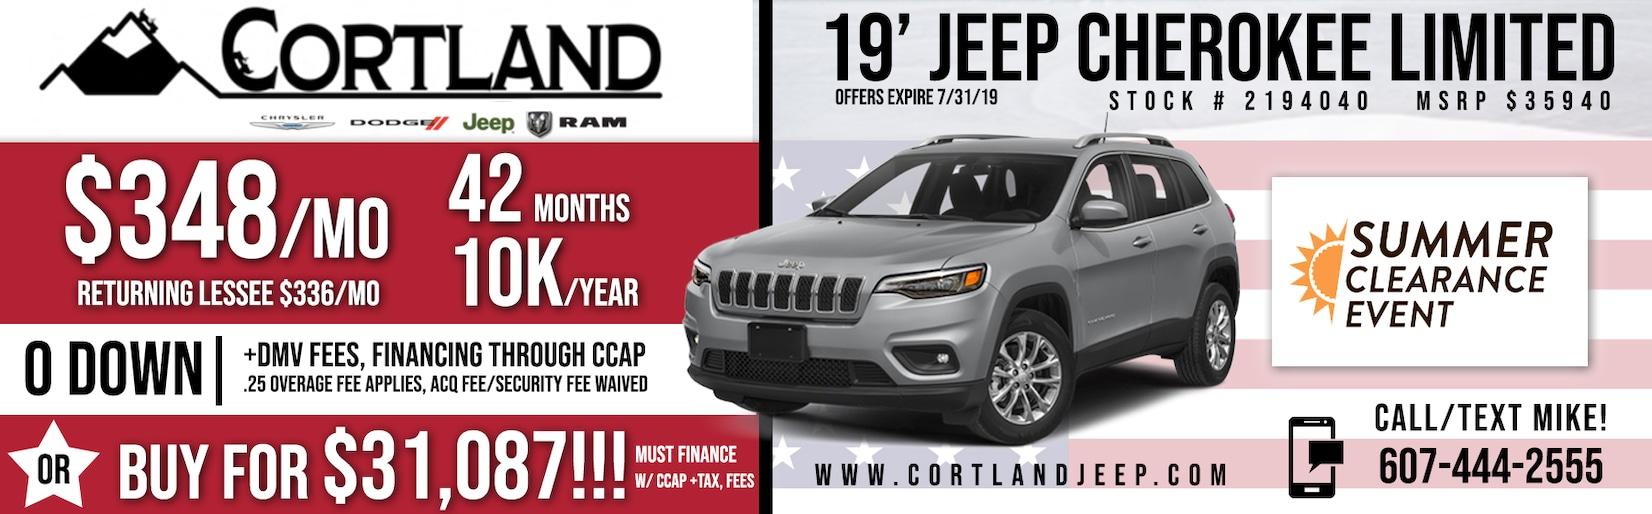 Cortland Chrysler Dodge Jeep Ram in Cortland, NY